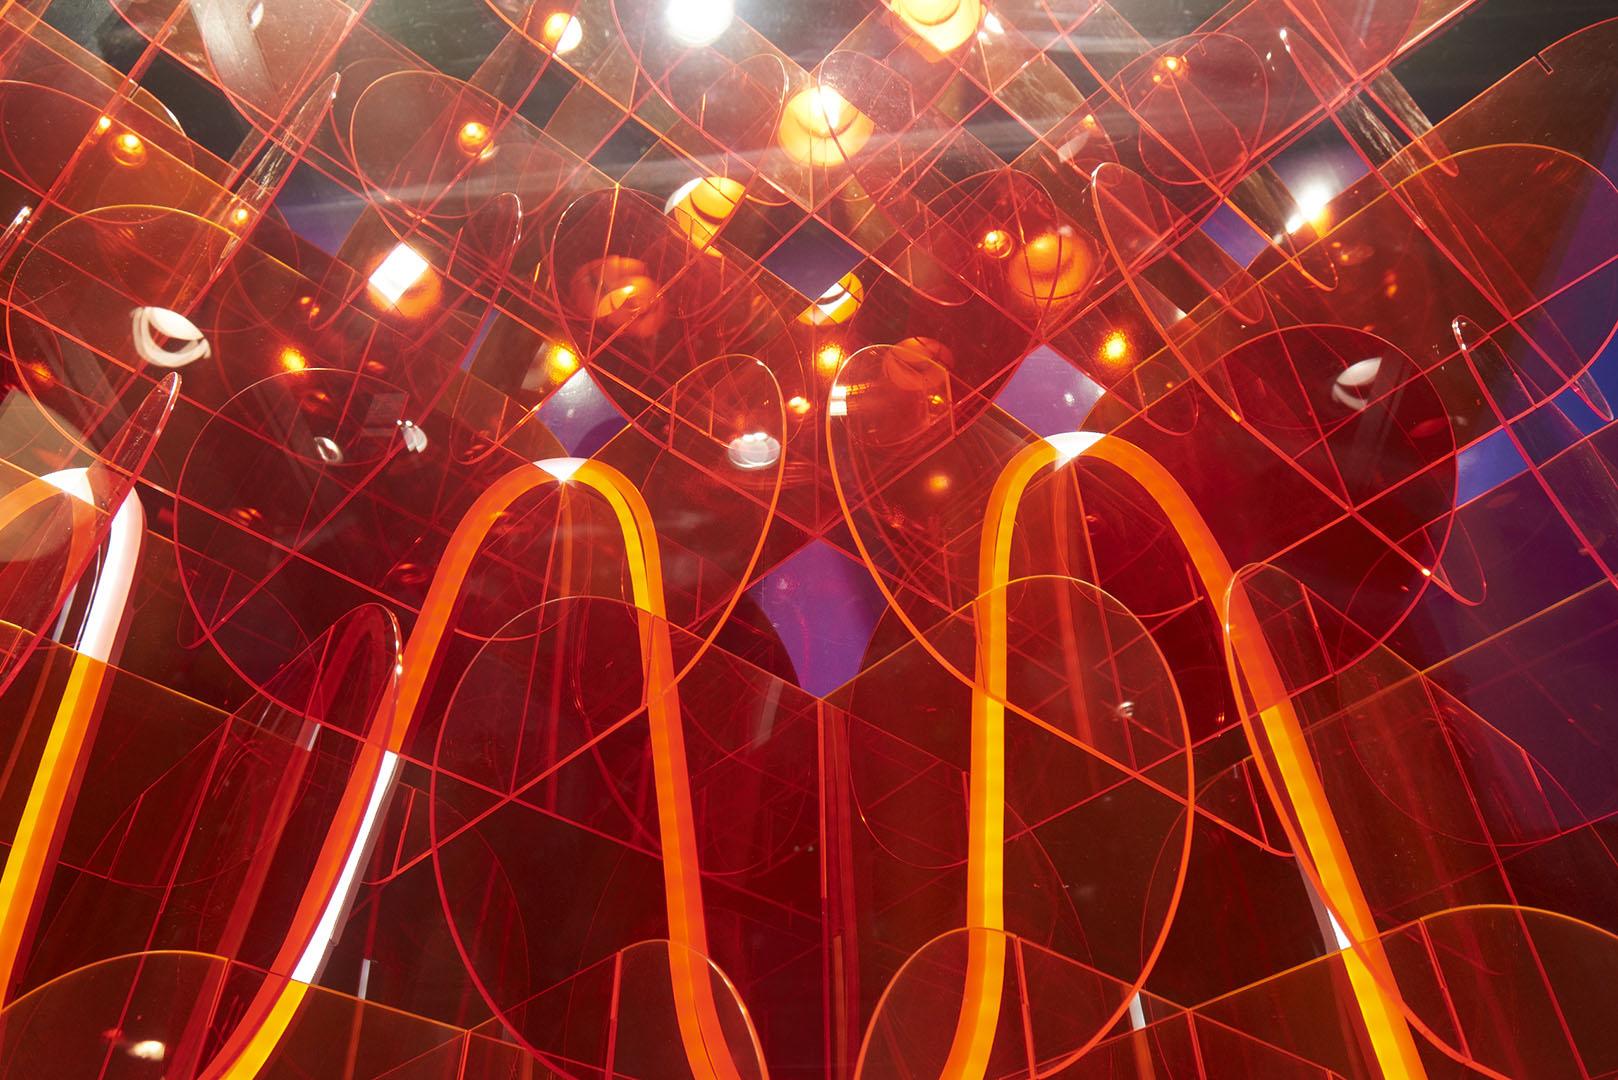 Abstract acrylic display